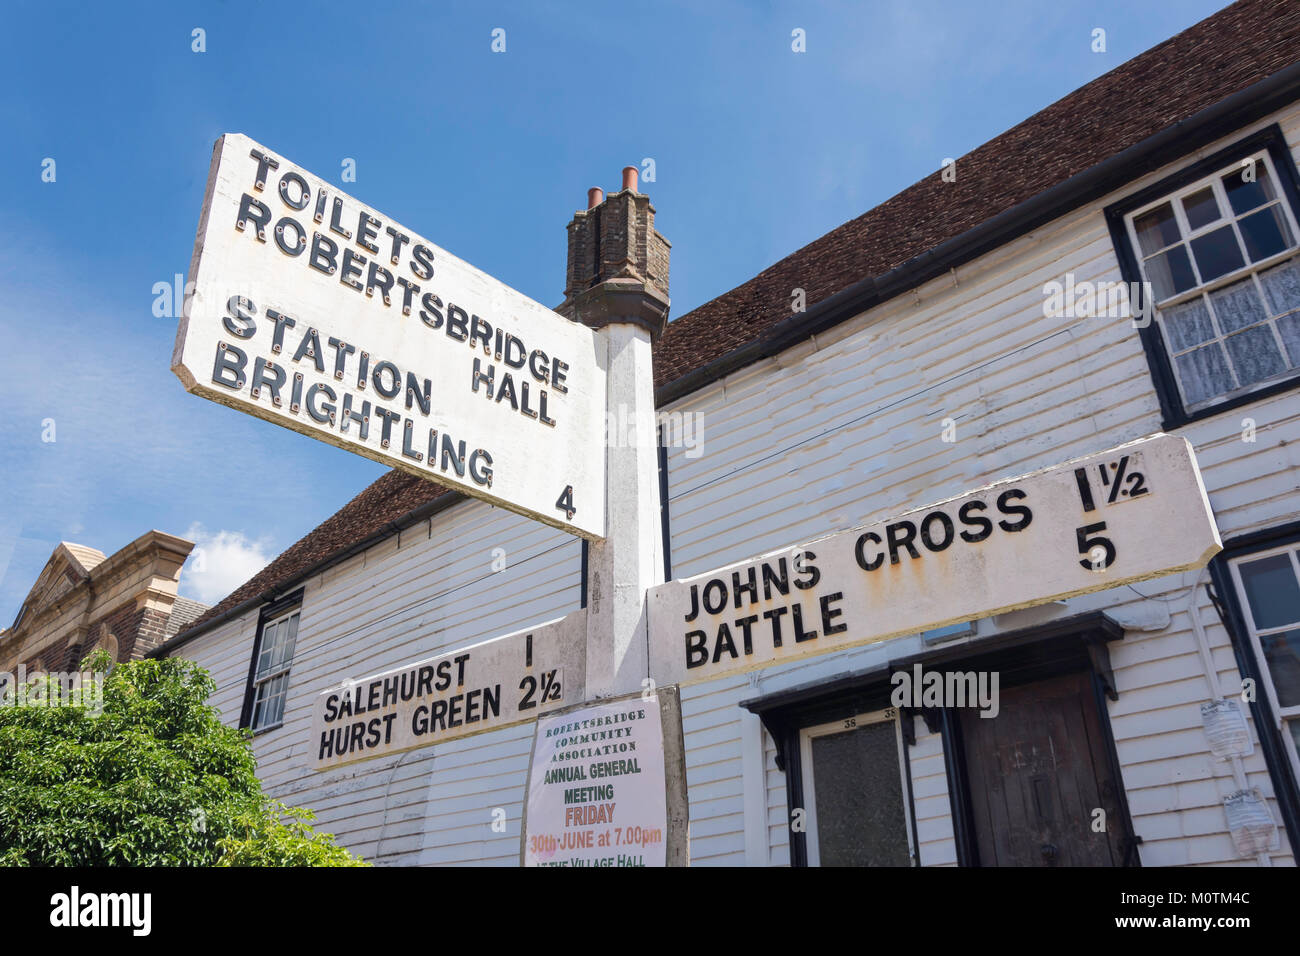 Distance Fingerpost signe, George Hill, Robertsbridge, East Sussex, Angleterre, Royaume-Uni Photo Stock